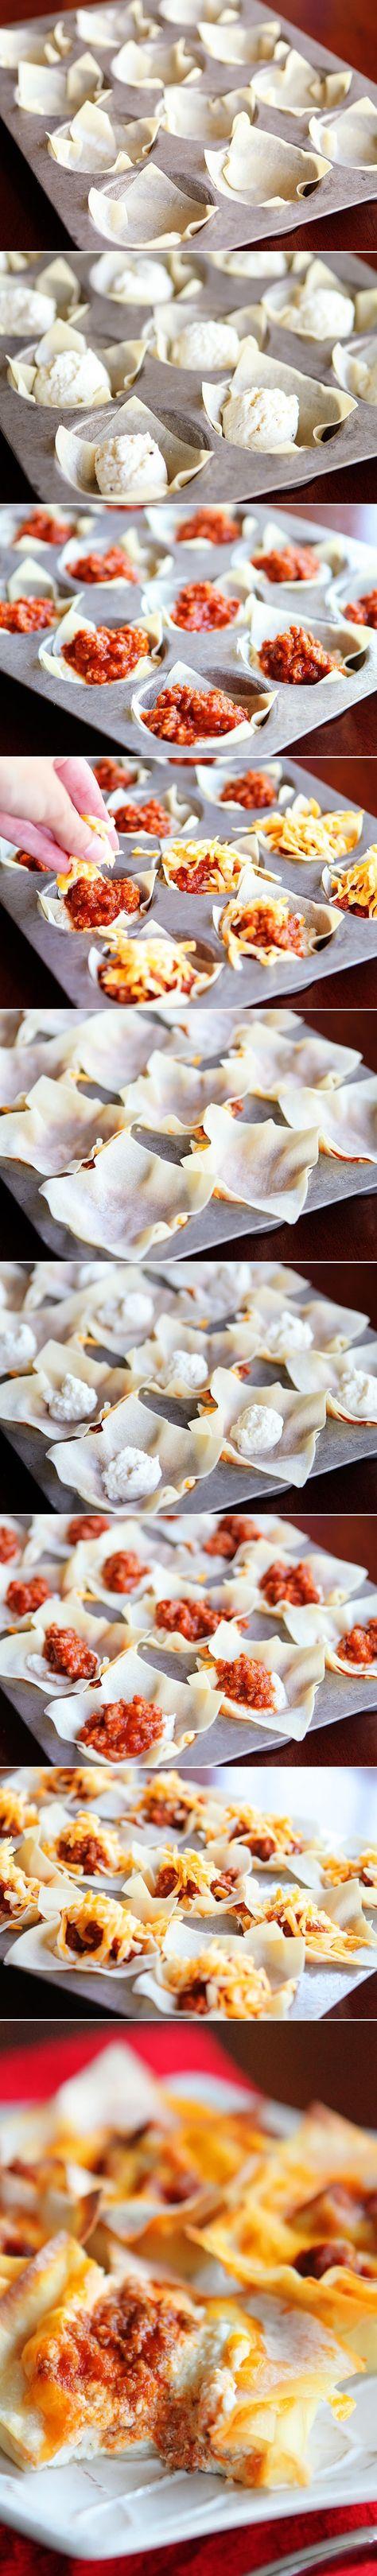 Mini Lasagna Cups- use Italian sausage, part-skim mozzarella, fresh parm, & fresh basil instead http://www.kevinandamanda.com/recipes/dinner/mini-lasagna-cups.html#_a5y_p=1014670